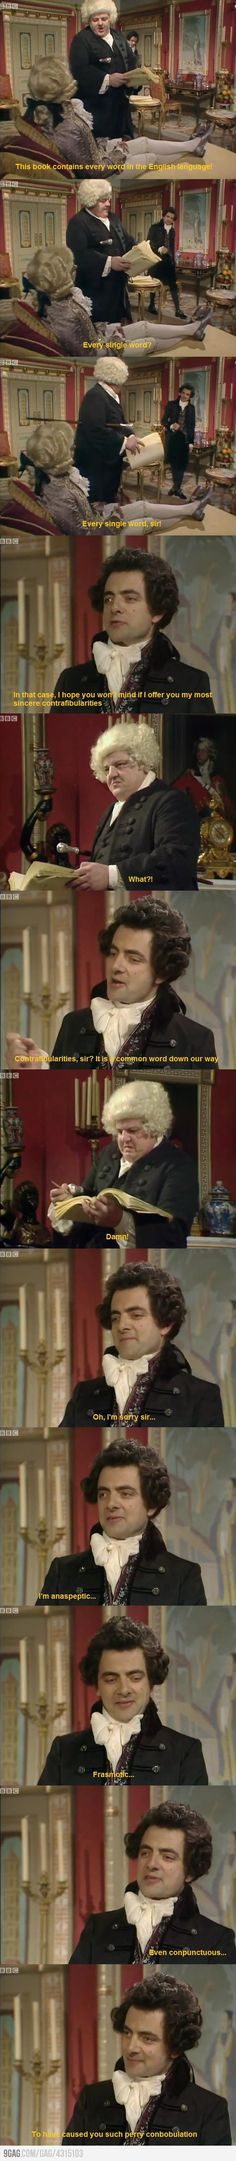 Black Adder trolling Dr. Johnson. One of the funniest scenes in Blackadder. This Blackadder was my favourite